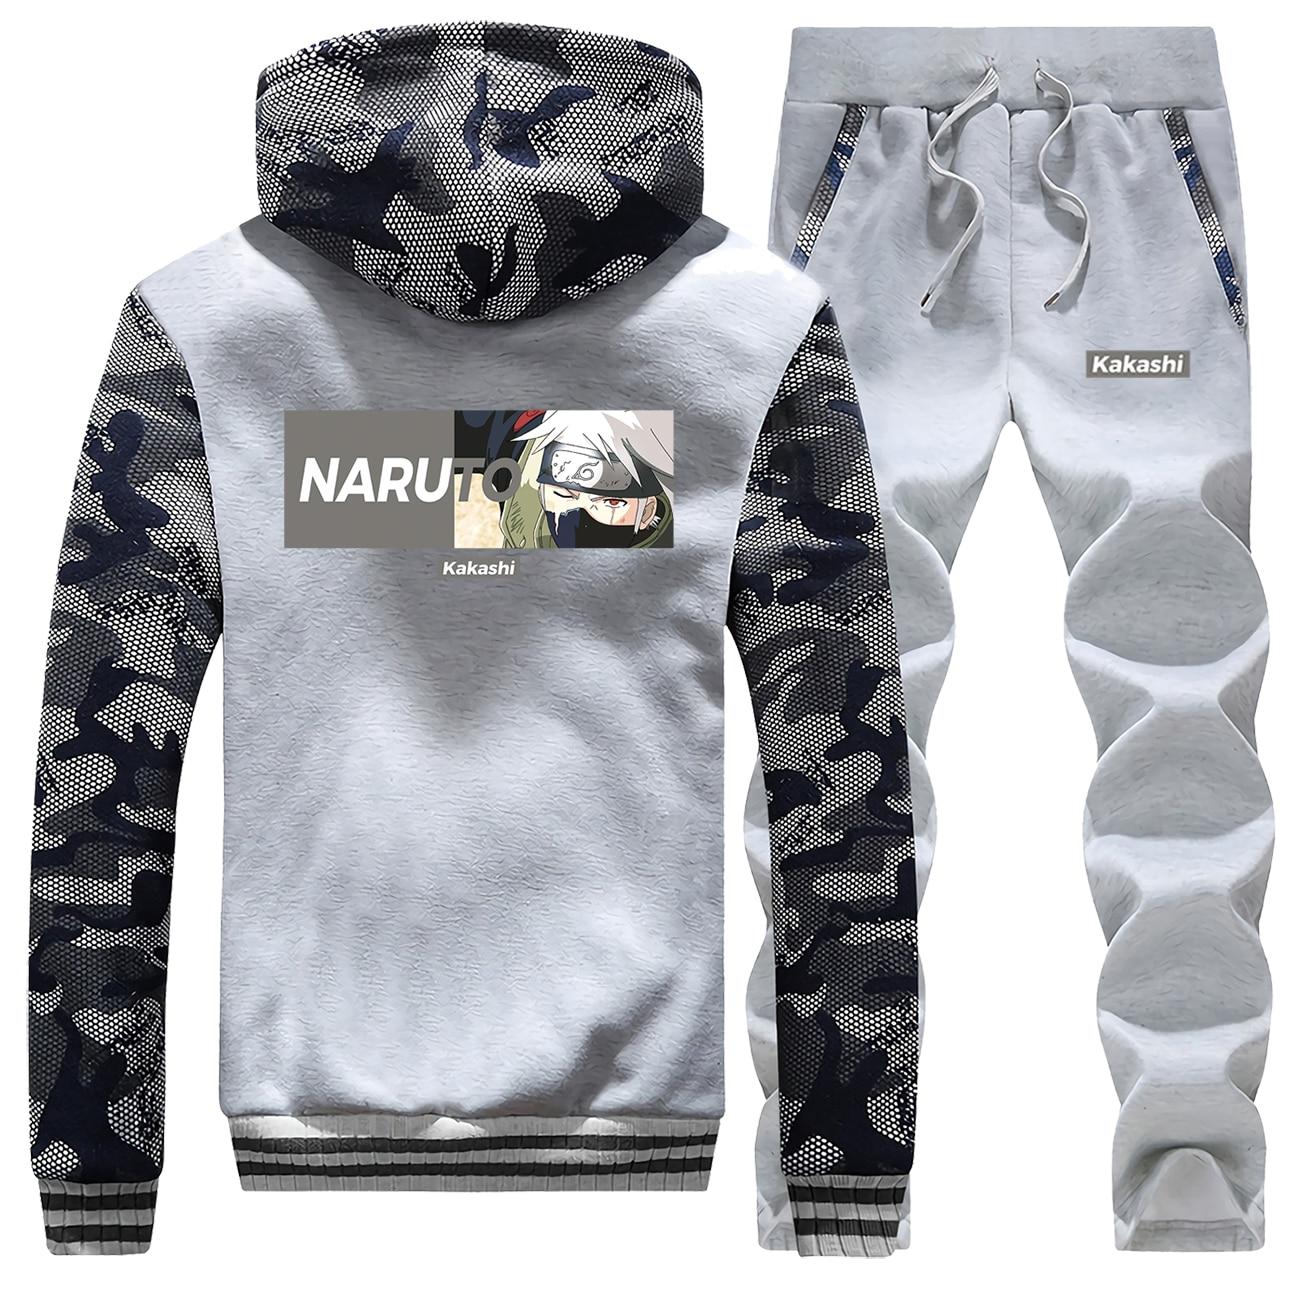 Naruto Male Set Japanese Anime Kakashi Camo Hoodies Men Winter Jacket Fleece Warm Outwear Pants 2019 Harajuku Fashion Sweatsuit